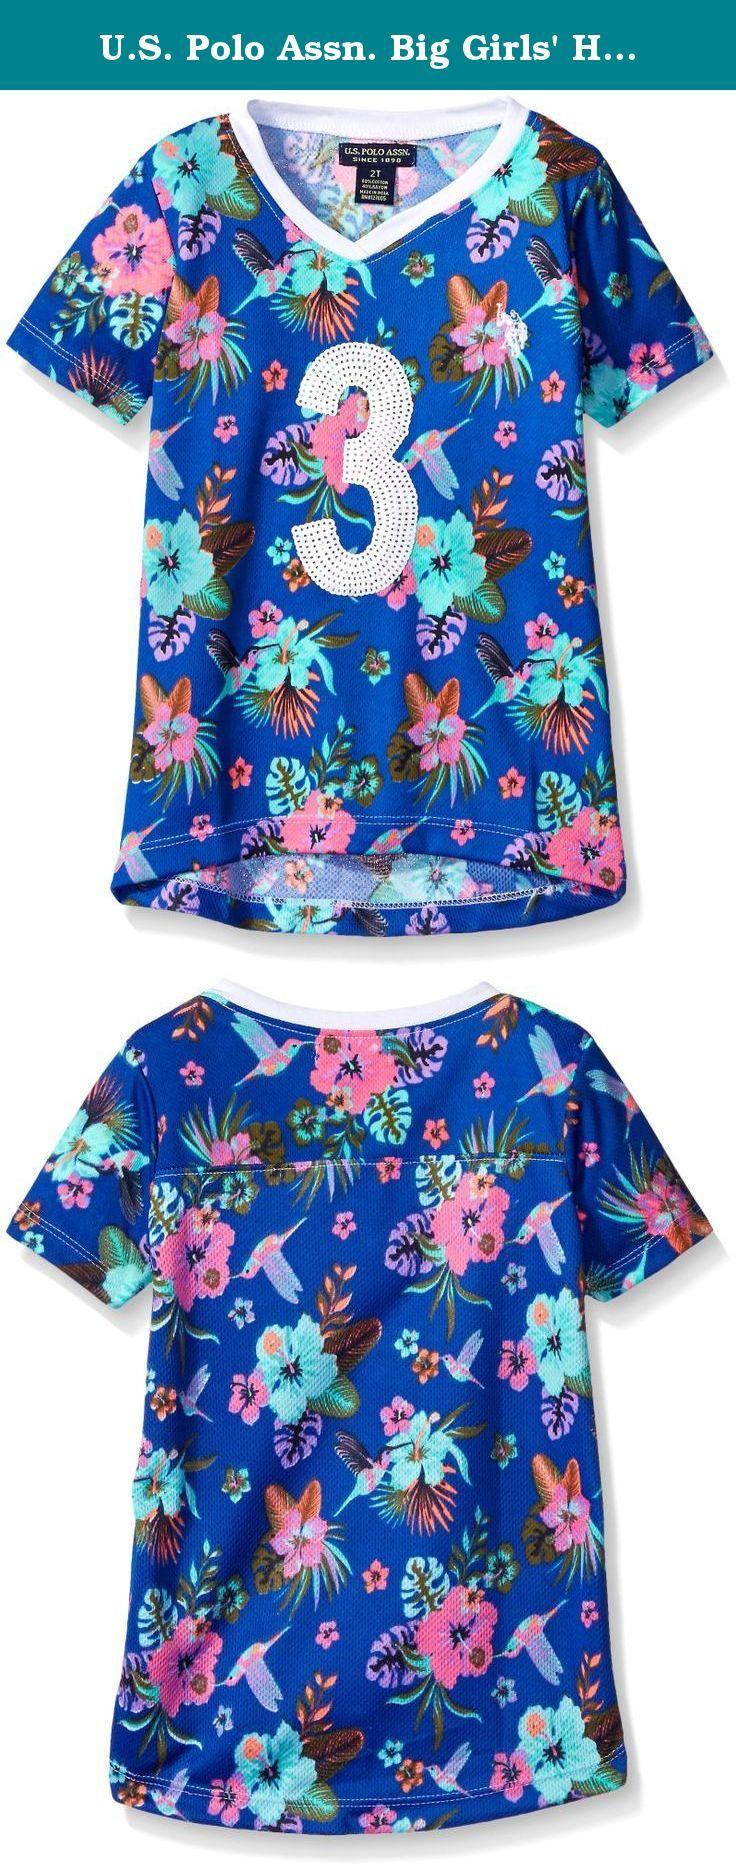 U.S. Polo Assn. Big Girls' Hummingbird and Floral Print Mini Mesh Football Shirt, Vintage Blue, 7/8. Mini mesh sequined trimmed v-neck football styled t-shirt.